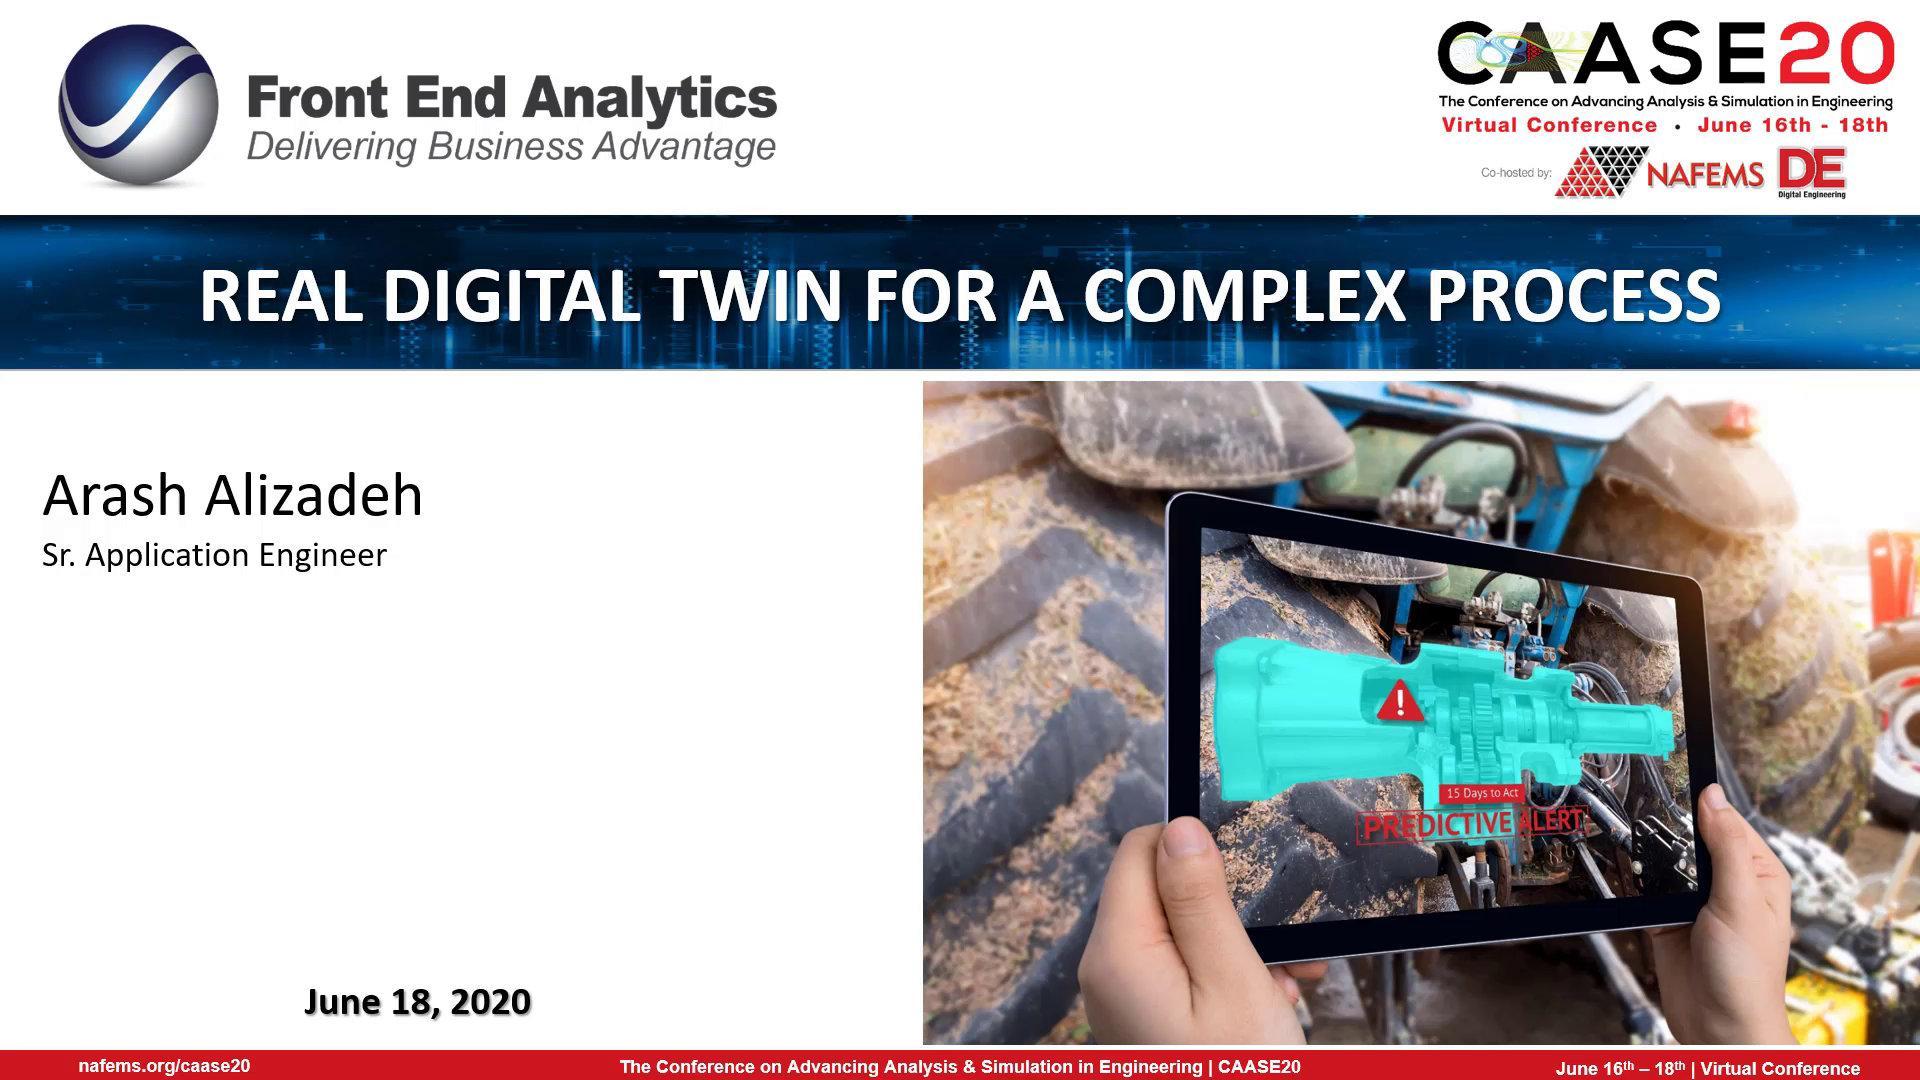 Real Digital Twin for a Complex Process webinar